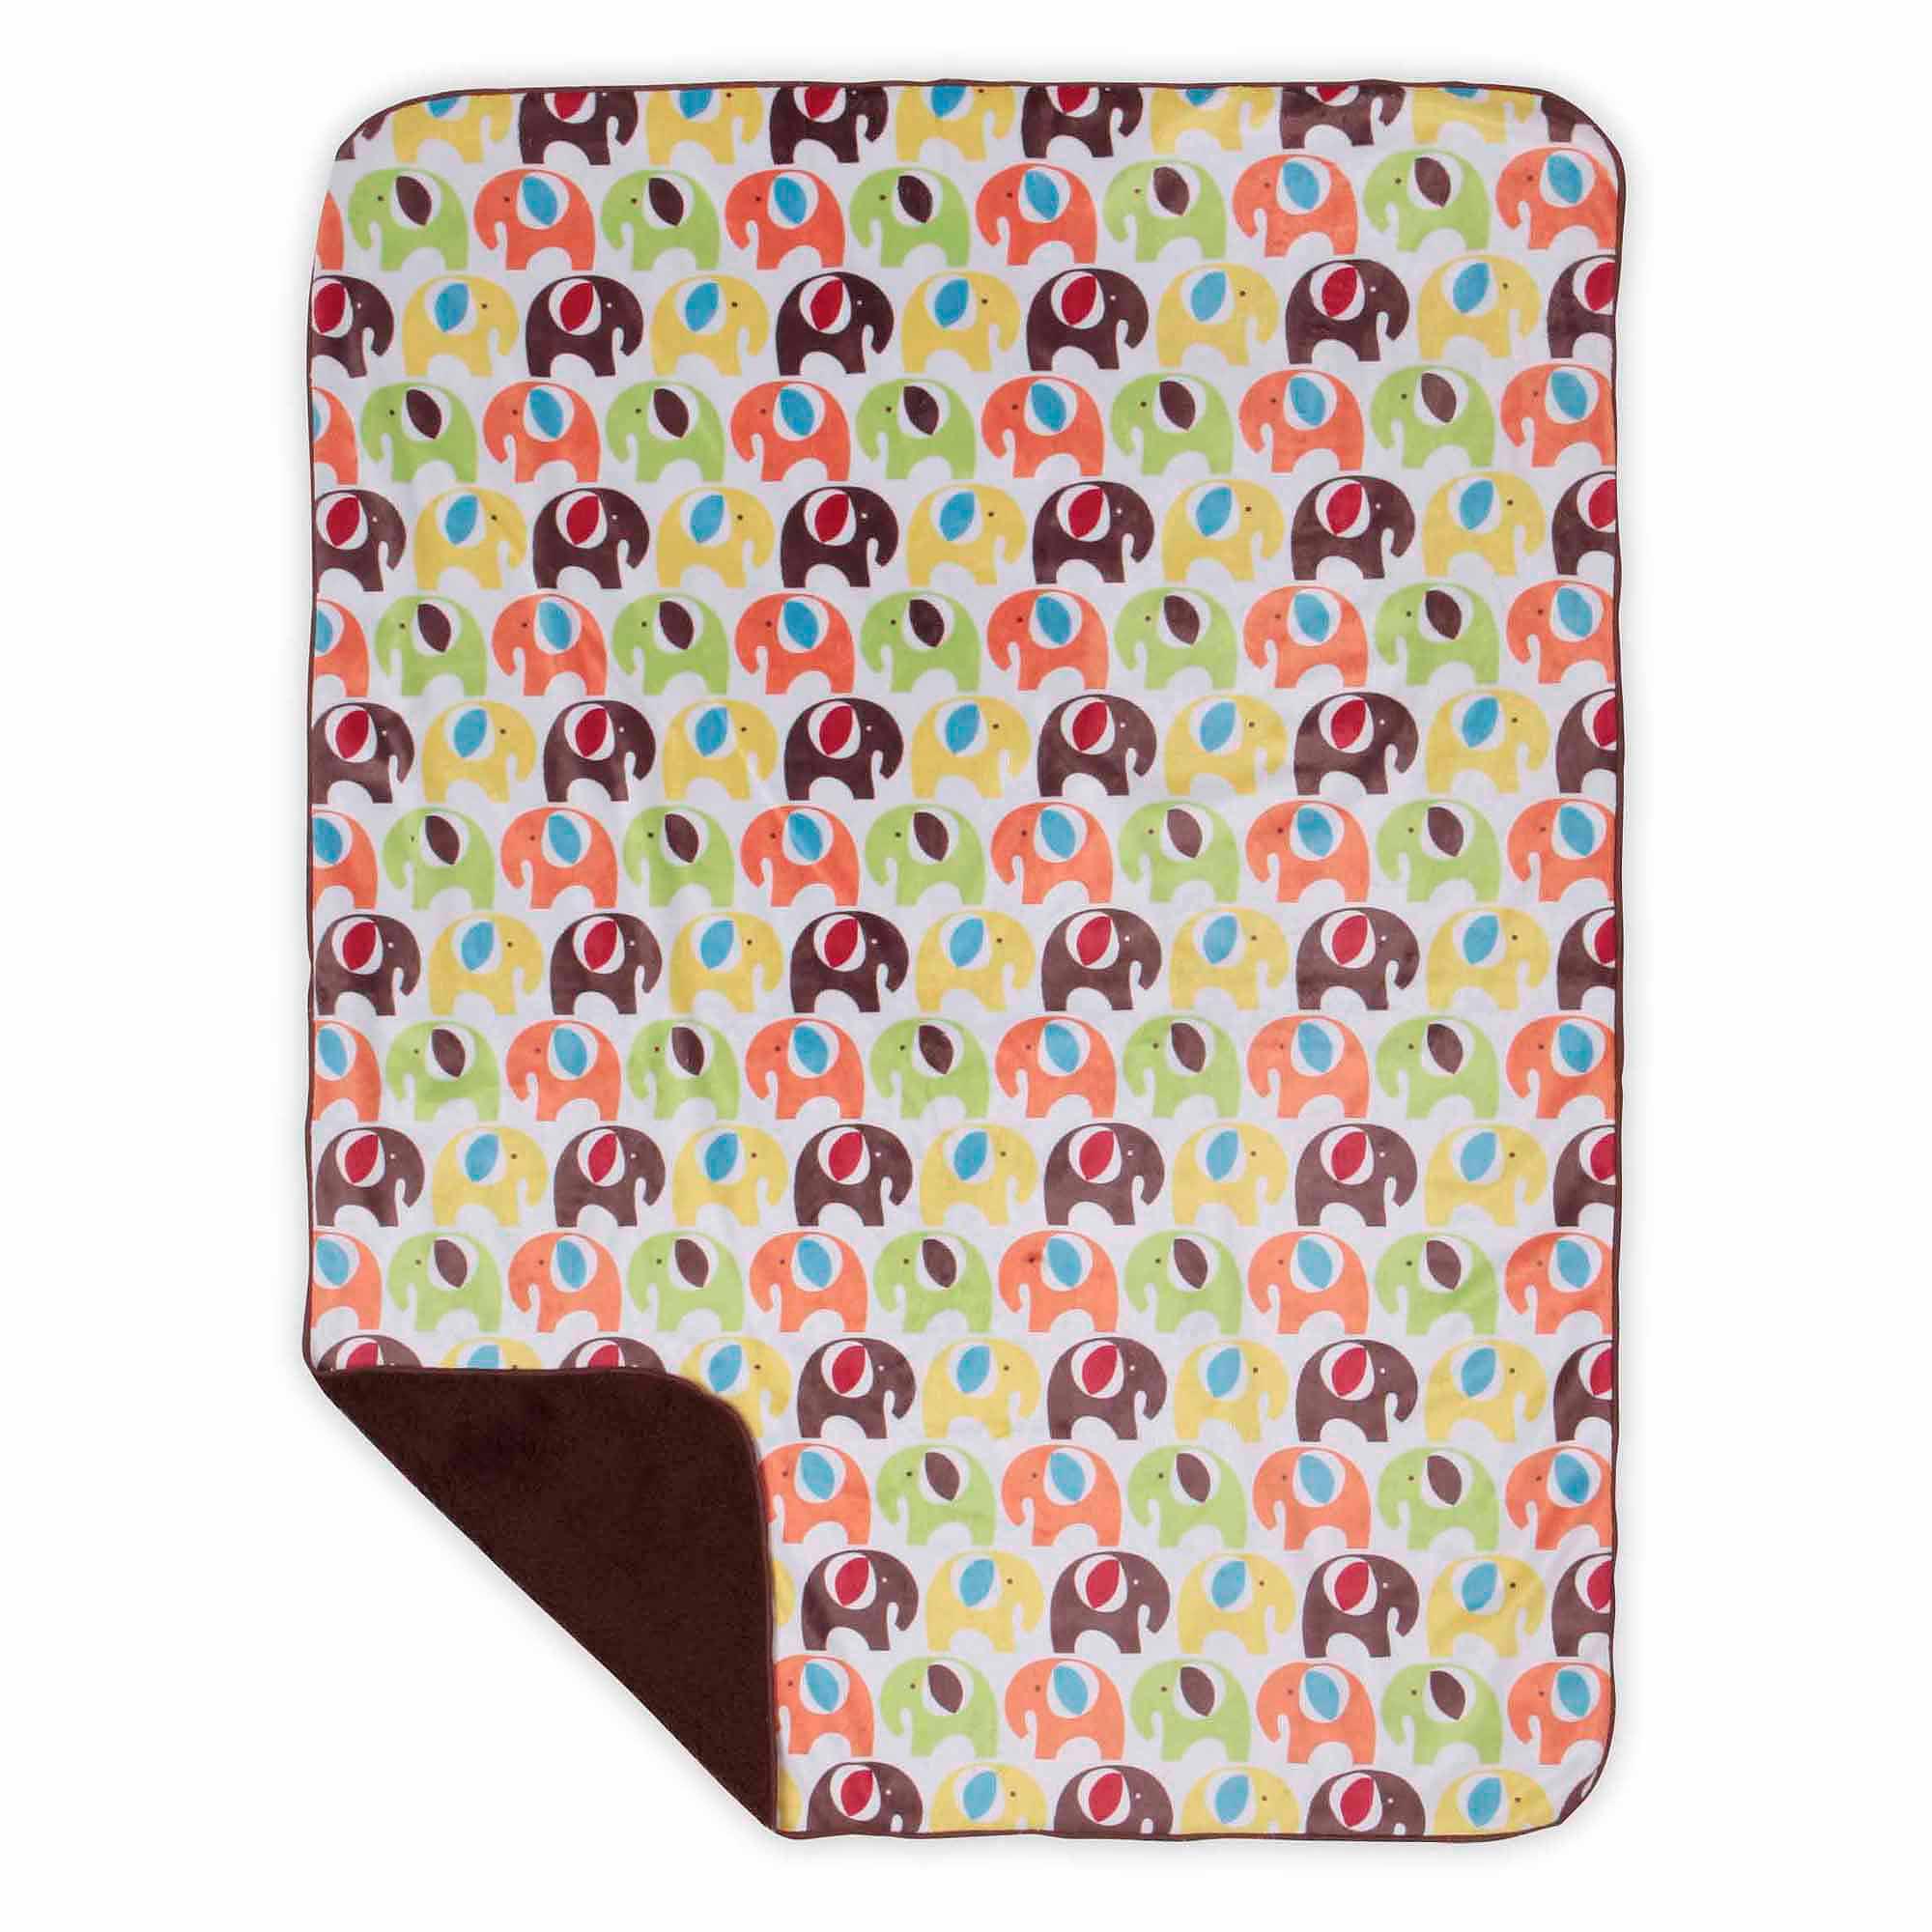 Bananafish Studio Elephant Print Minky Reversible Blanket